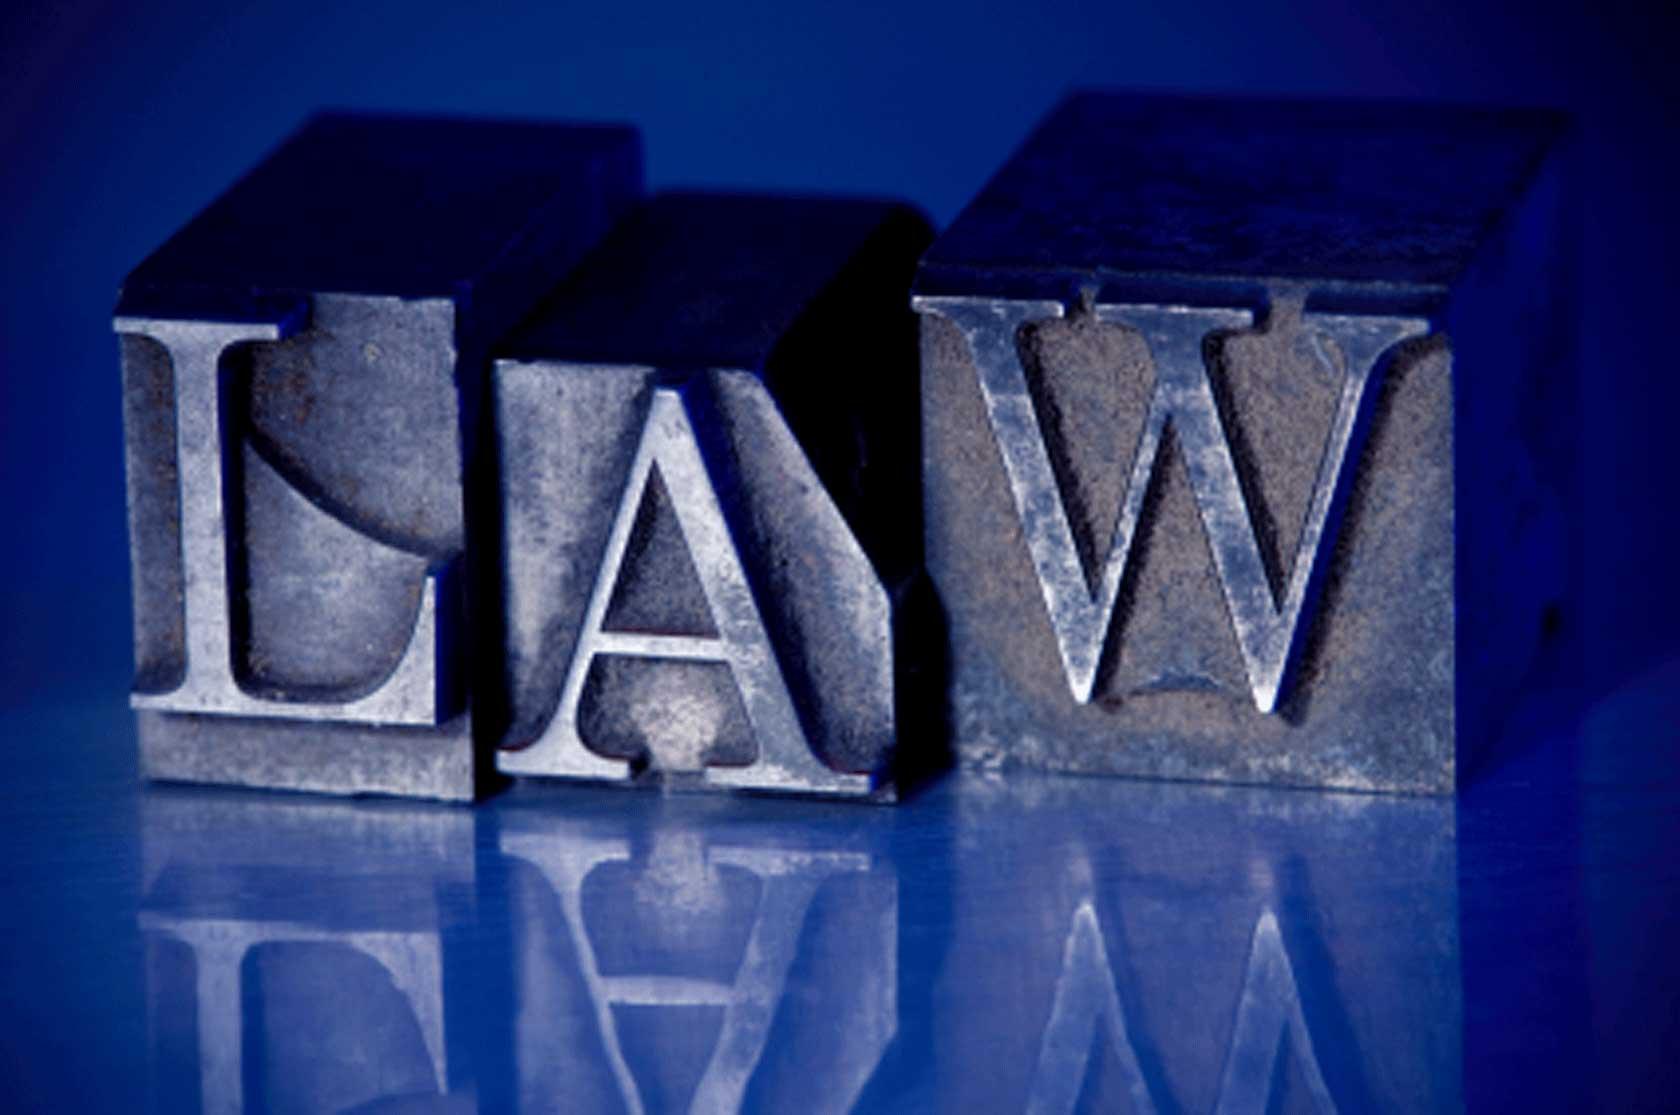 Florida Criminal Law Florida Criminal Statute Florida DUI Laws Florida DUI Statutes Orlando Criminal Attorney FL Criminal Defense Laws